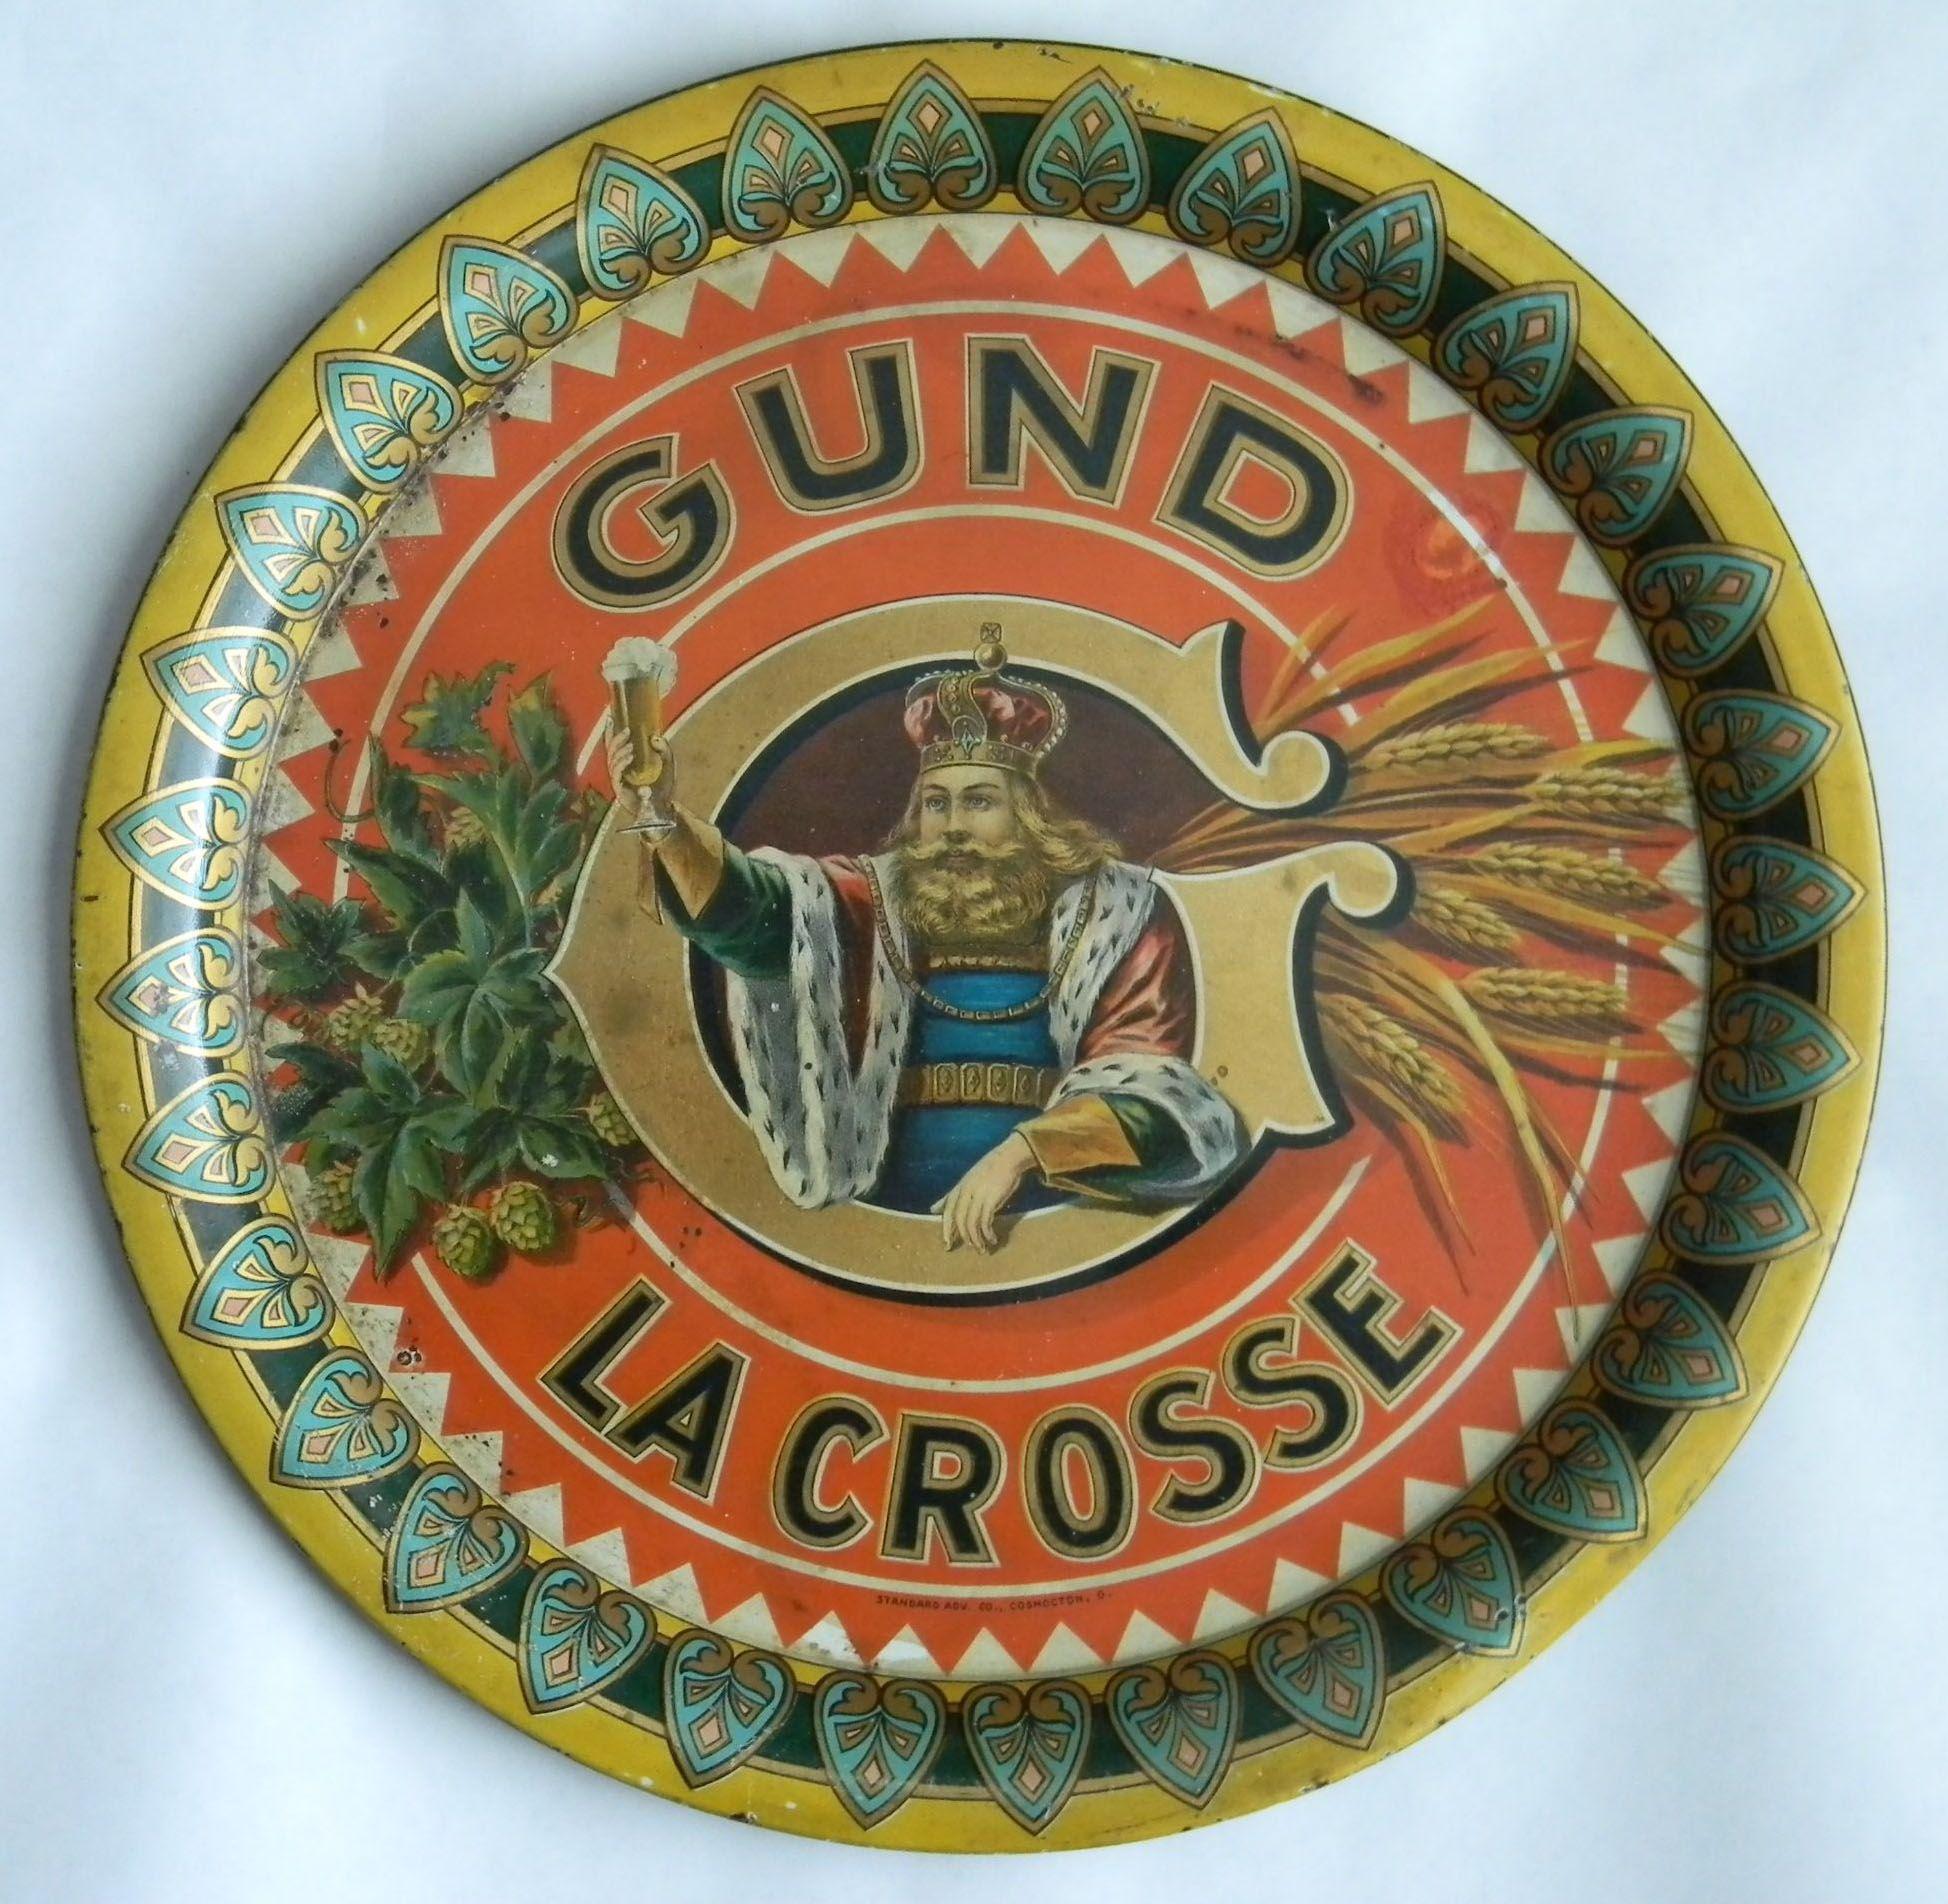 Gund king gambrinus beer tray gund brewing co la crosse